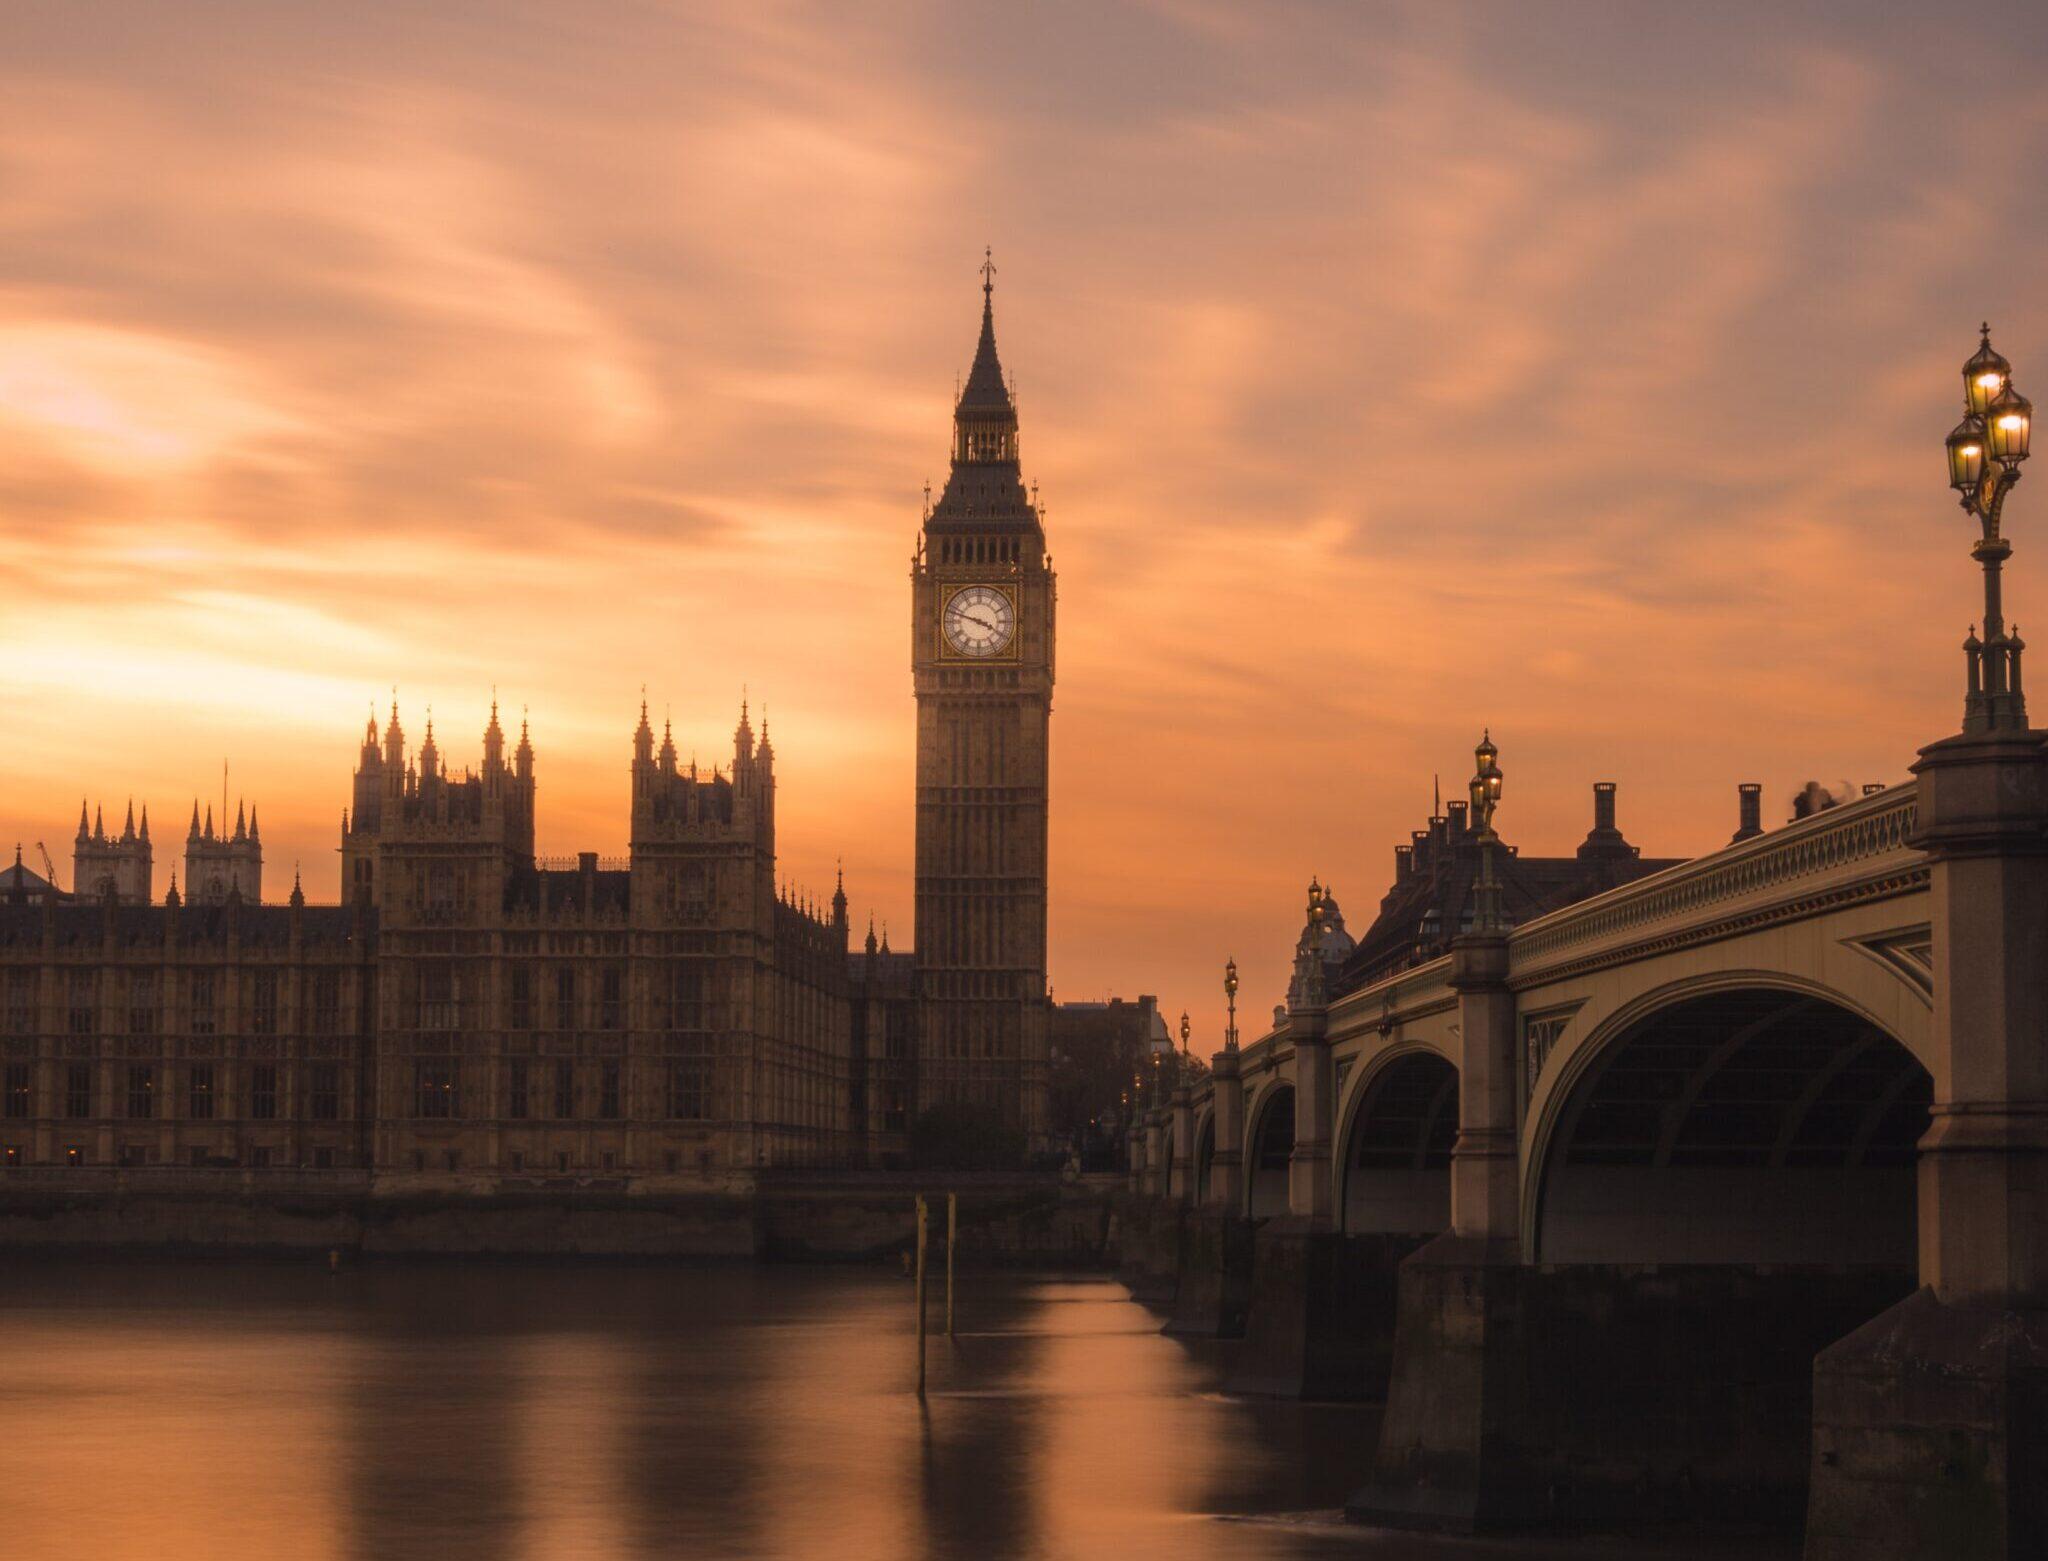 Parliamentary Reactions to the new EU trade deal